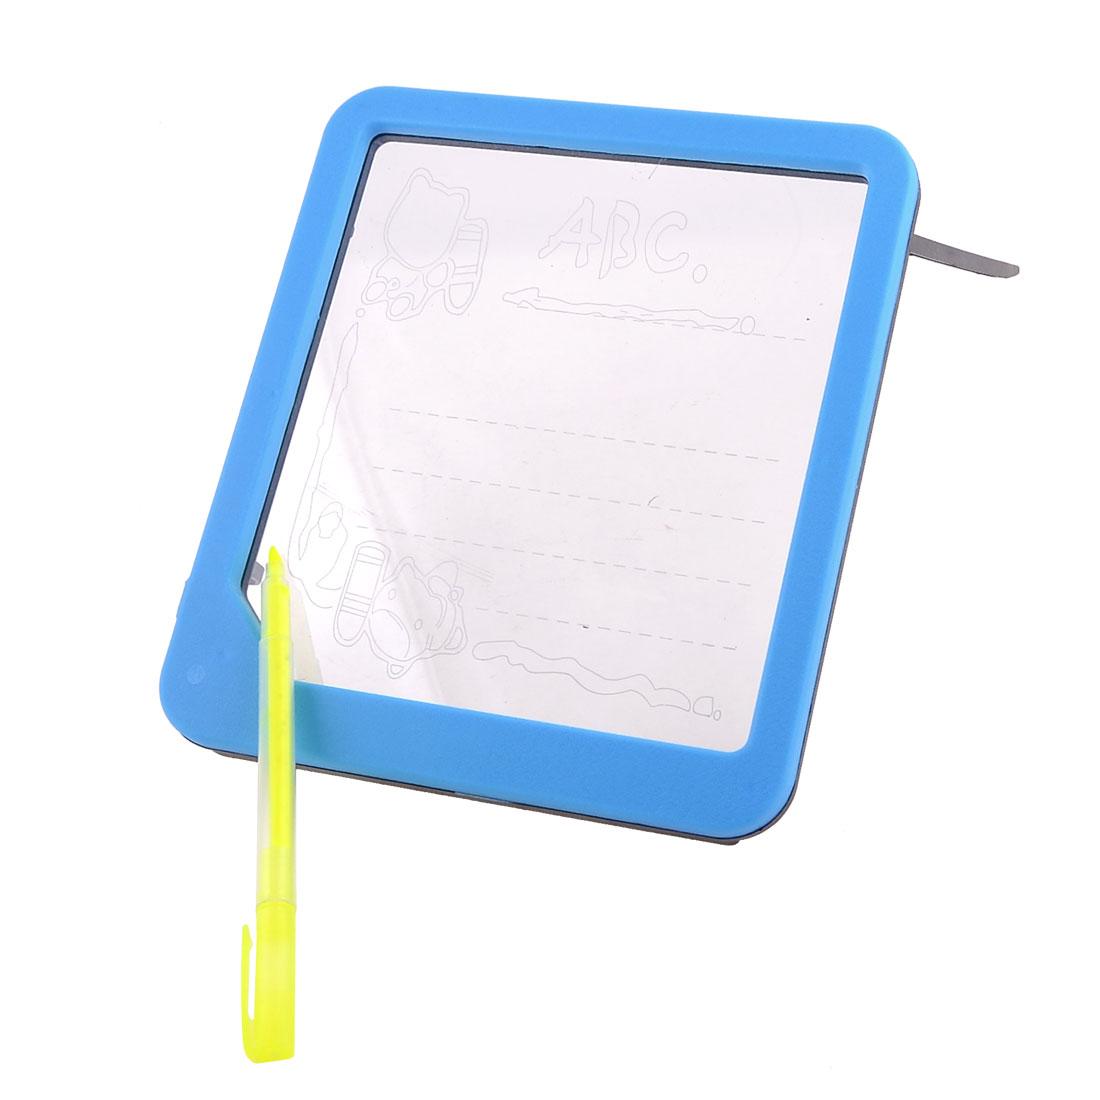 Sky Blue Frame Glowing 5 LED Message Writing Board w Green Yellow Pen